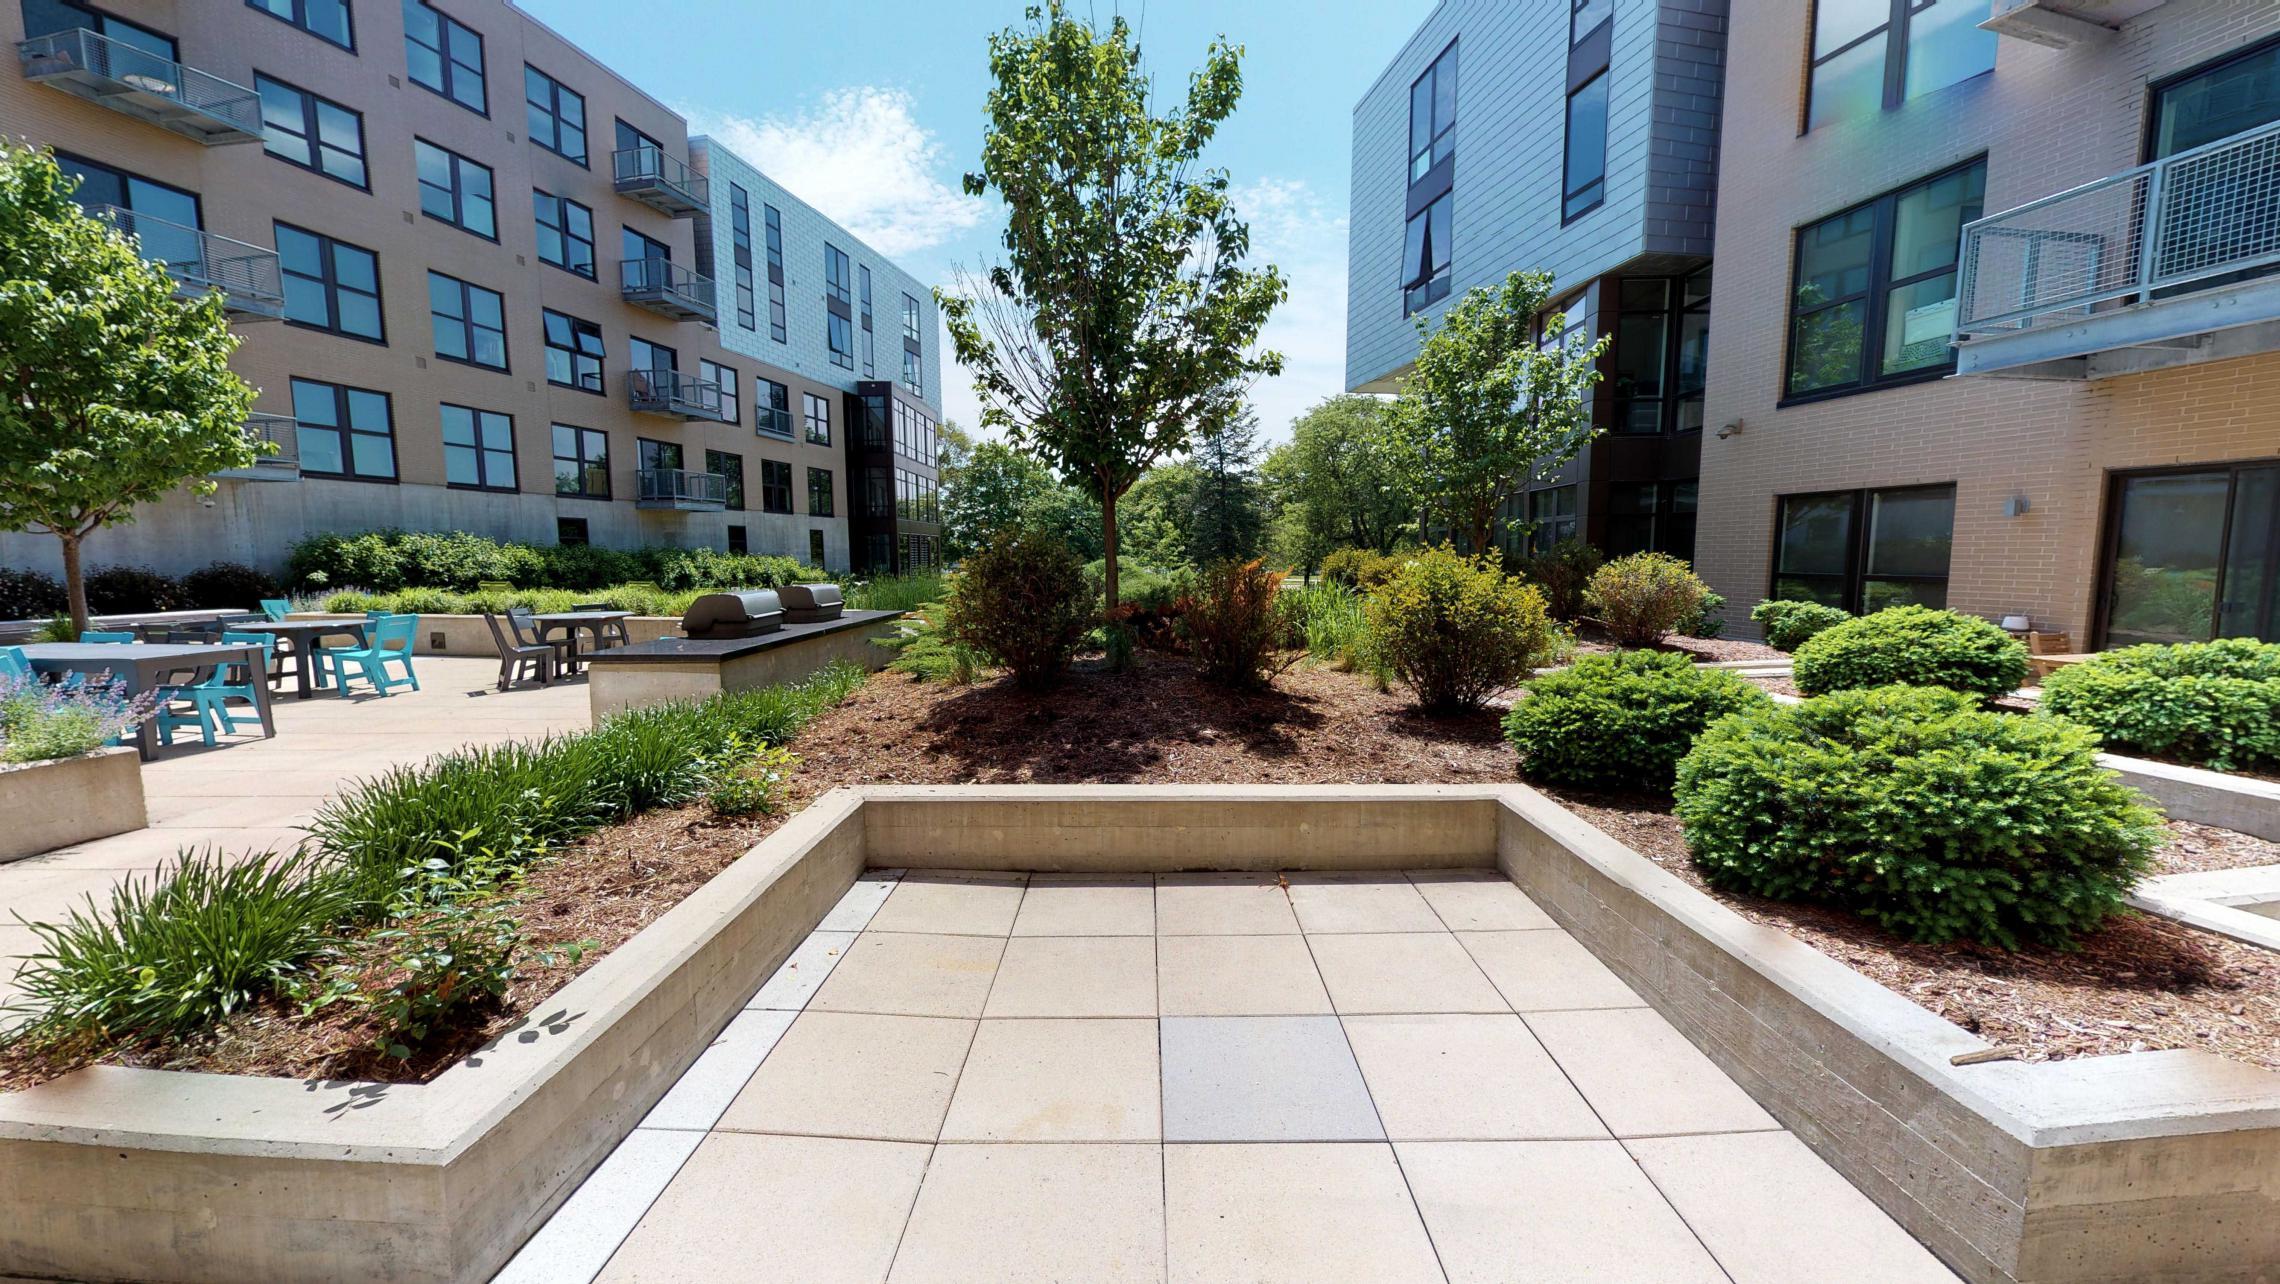 SEVEN27-Apartment-115-studio-lake view-modern-upscale-downtown-madison-patio-courtyard.jpg